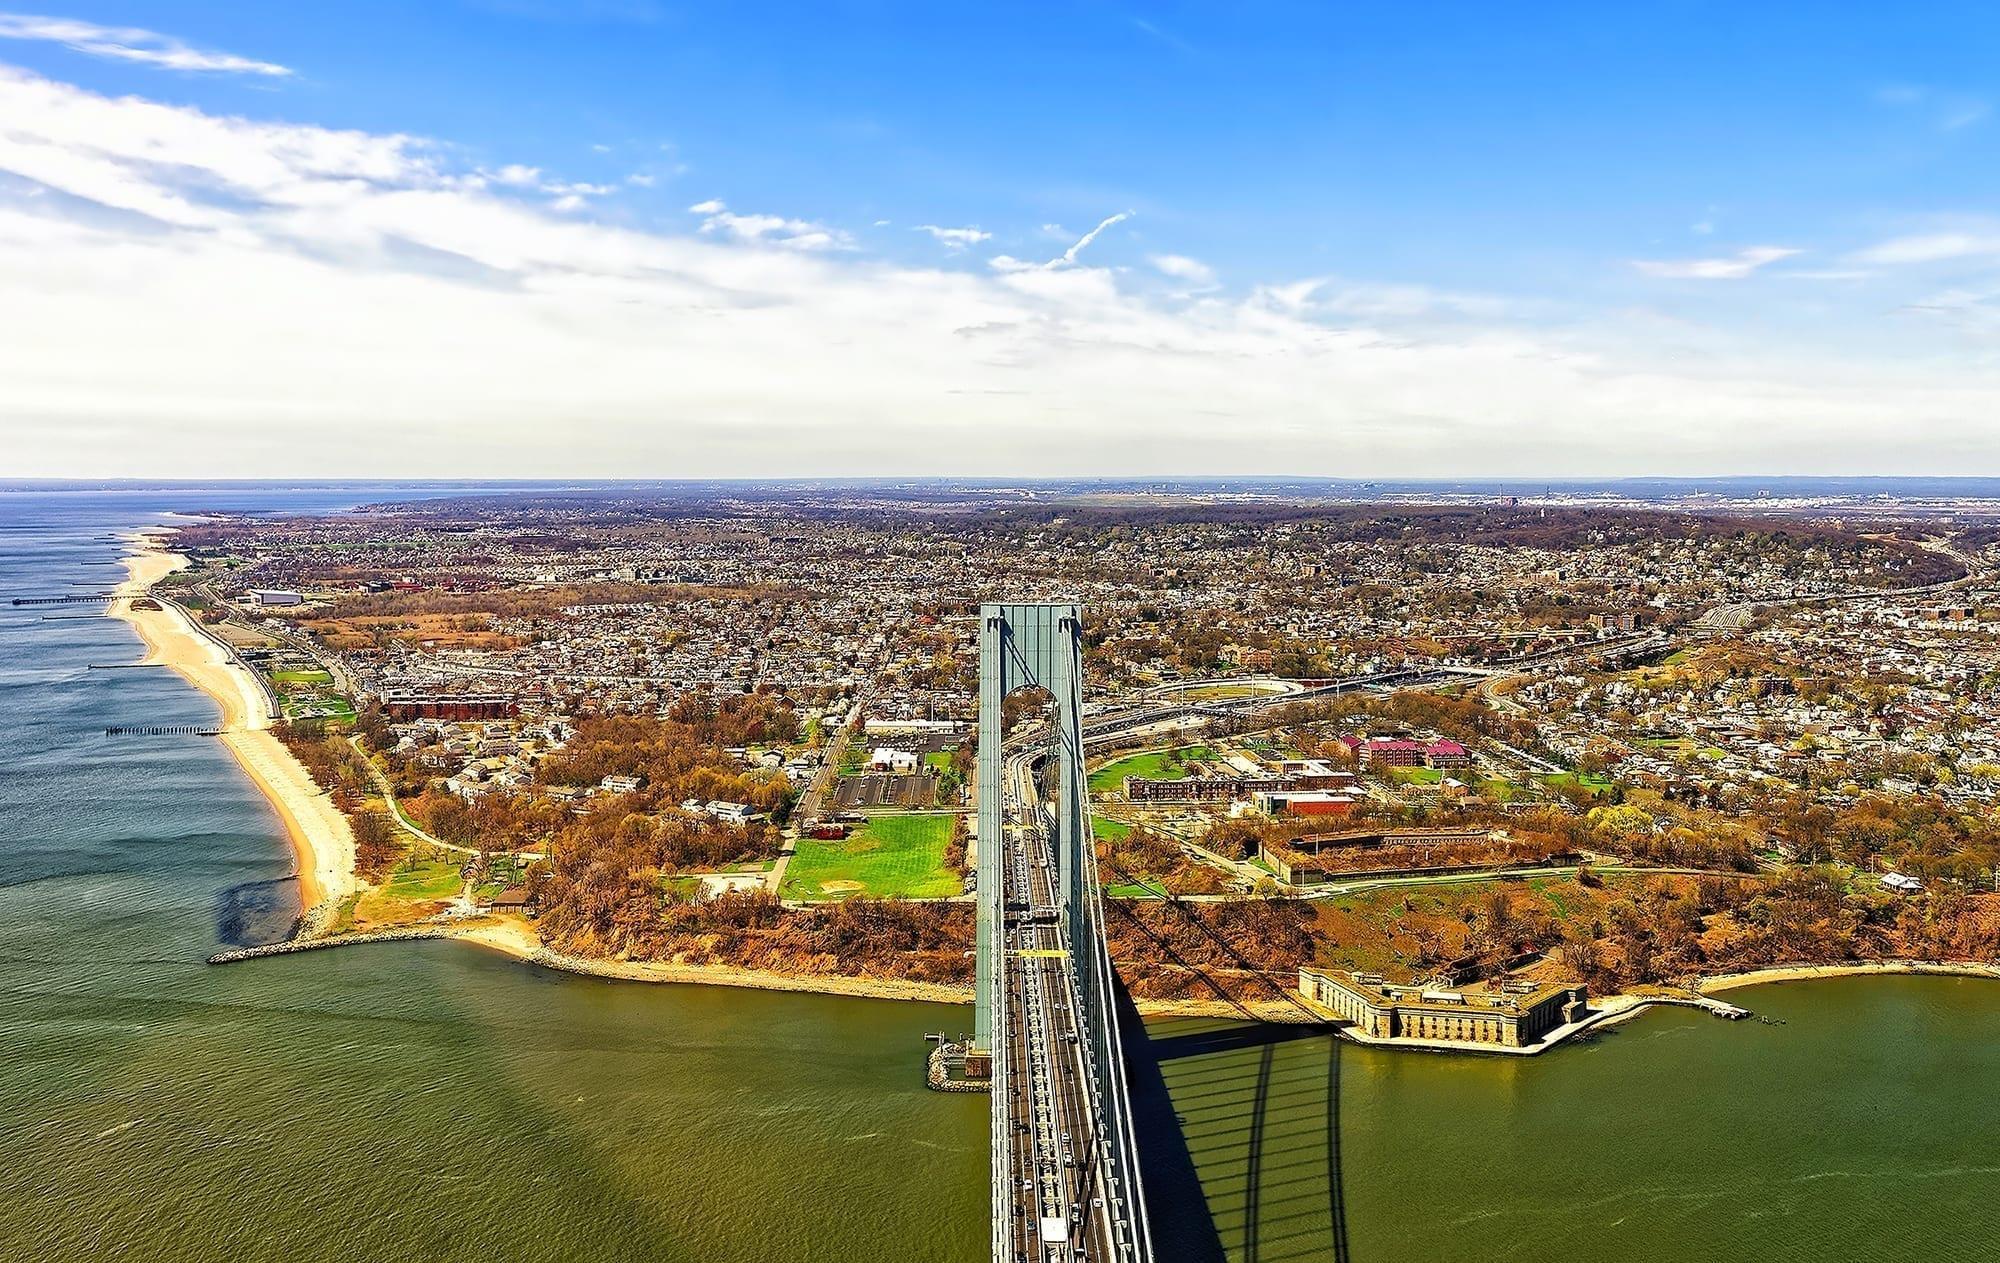 The Verrazano-Narrows Bridge, leading into Staten Island